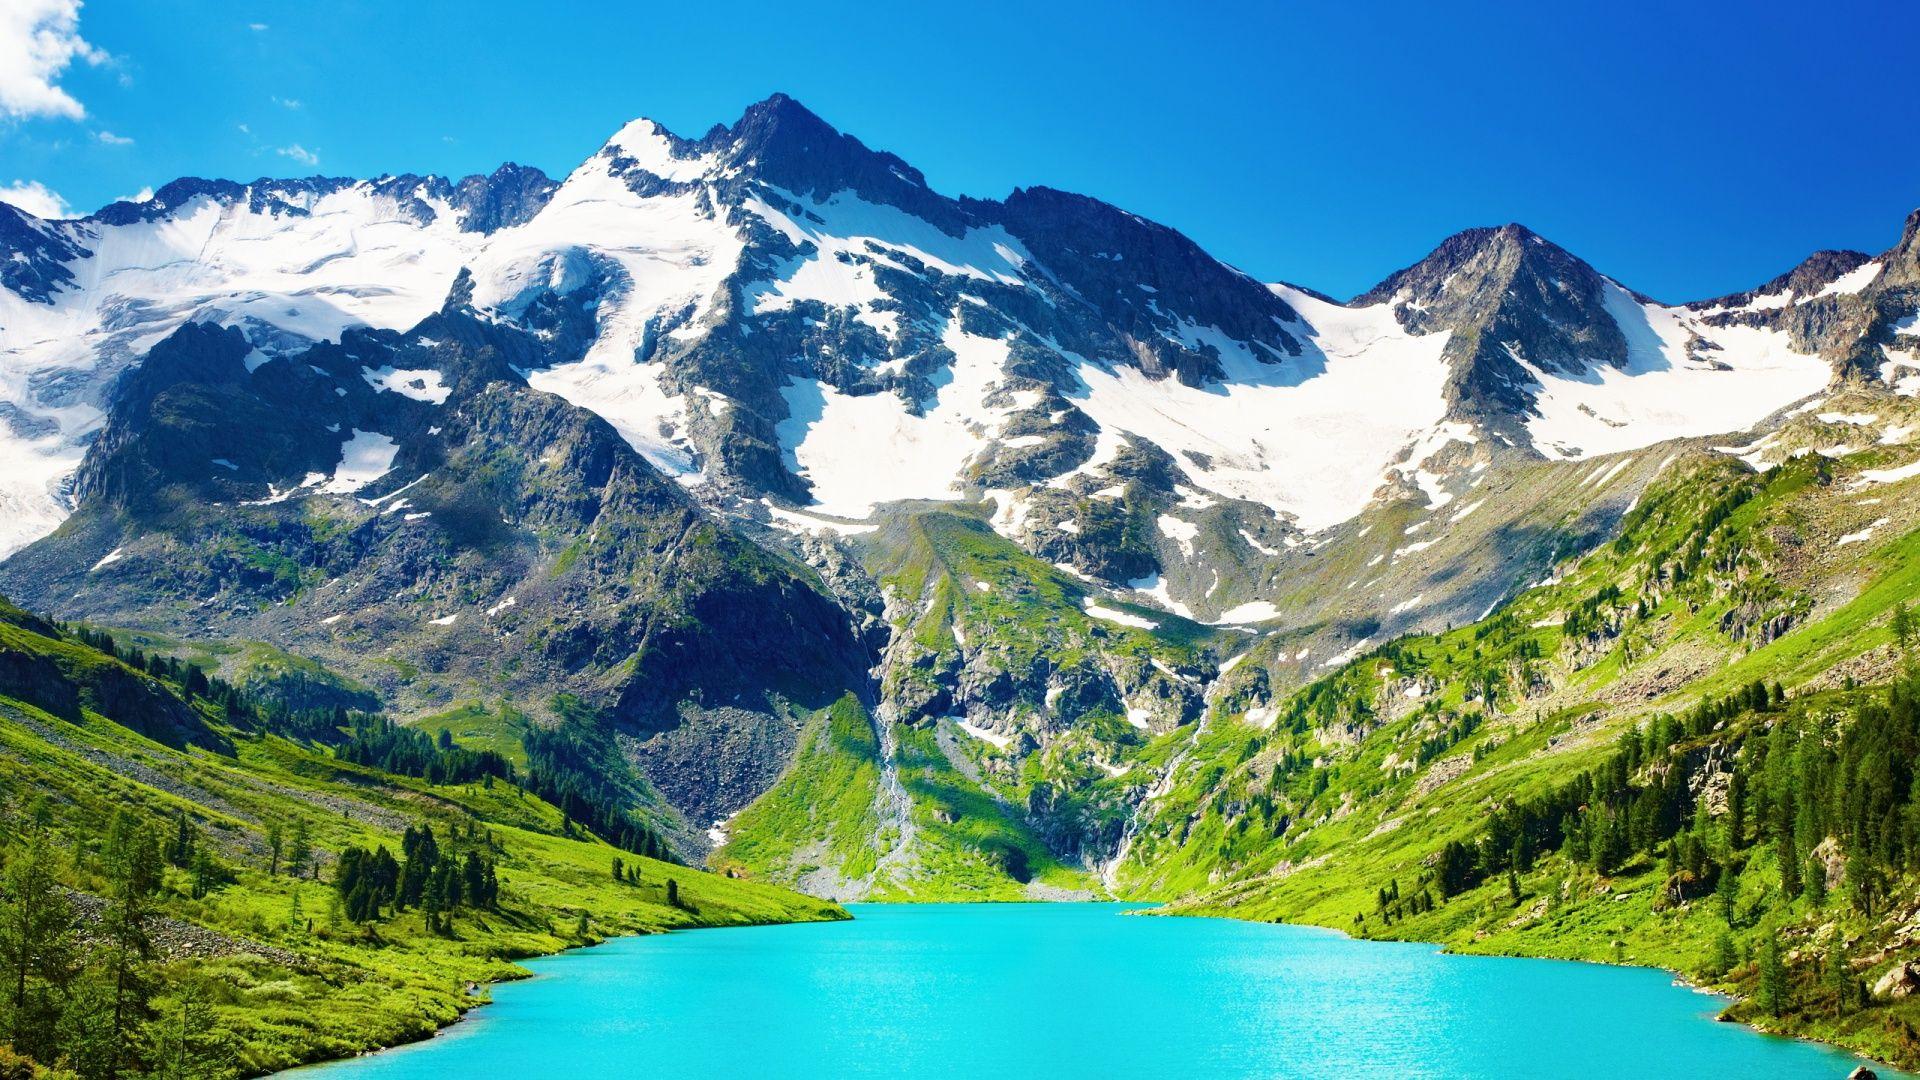 Blue lake mountain mountains pinterest image search and lakes blue lake mountain voltagebd Images